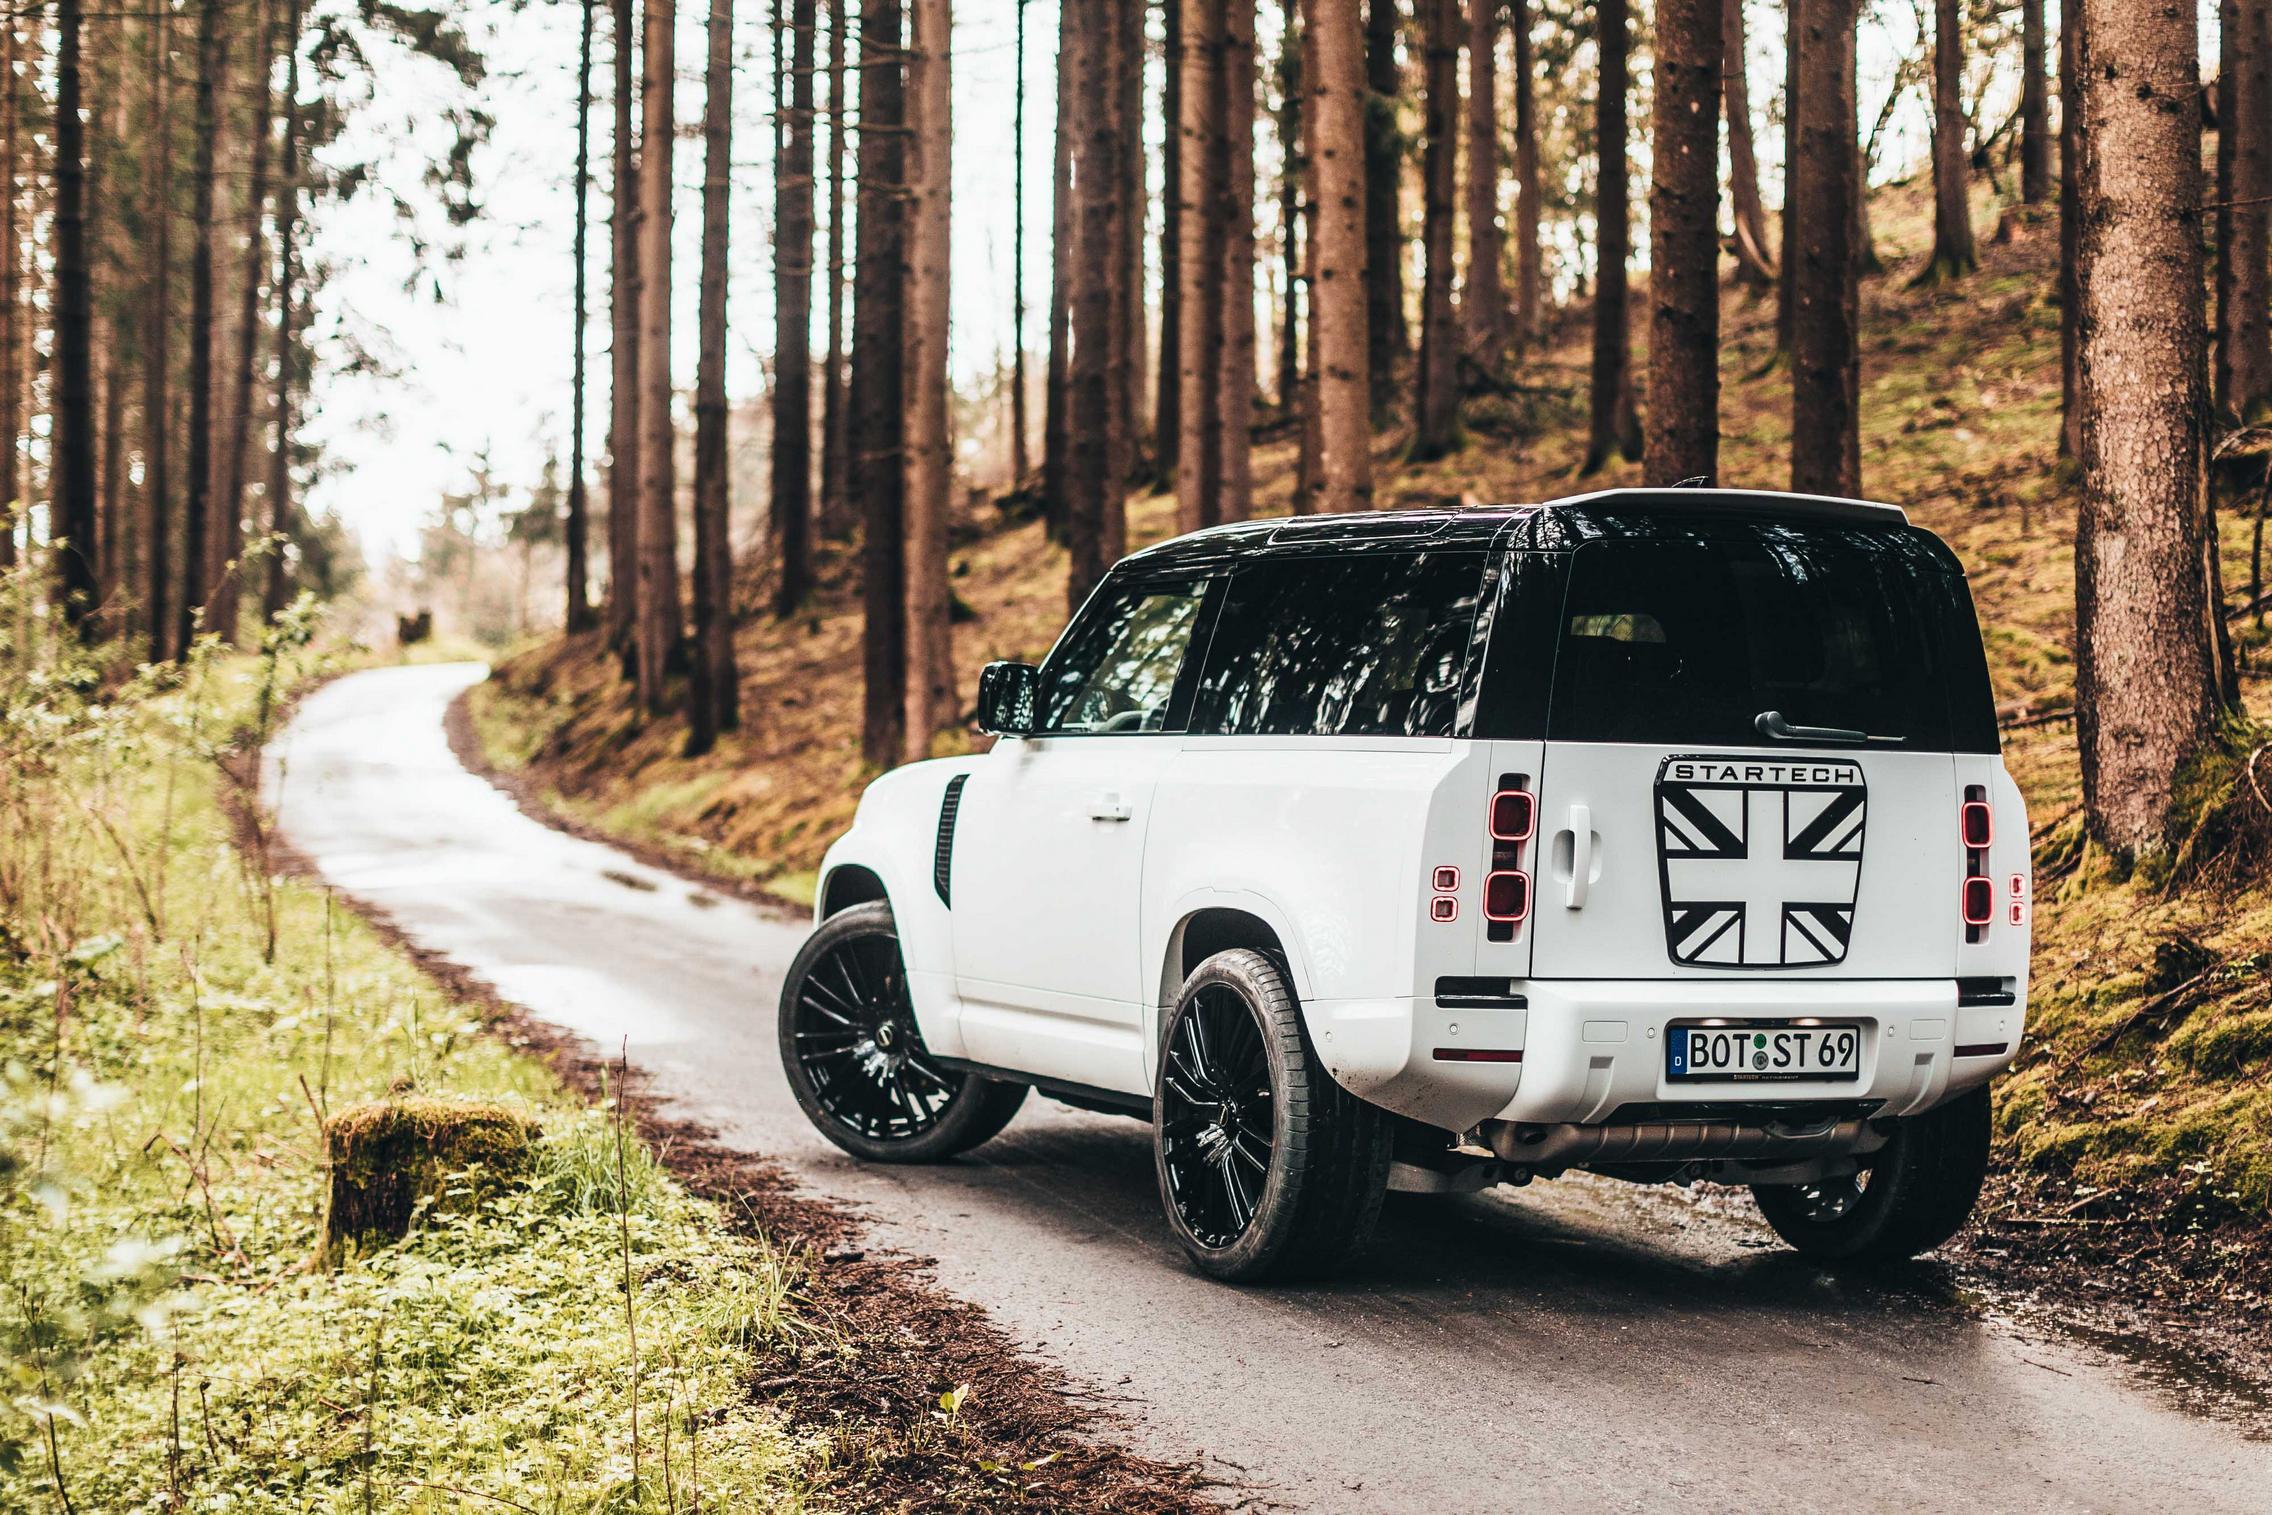 Startech Land Rover Defender 90 rear